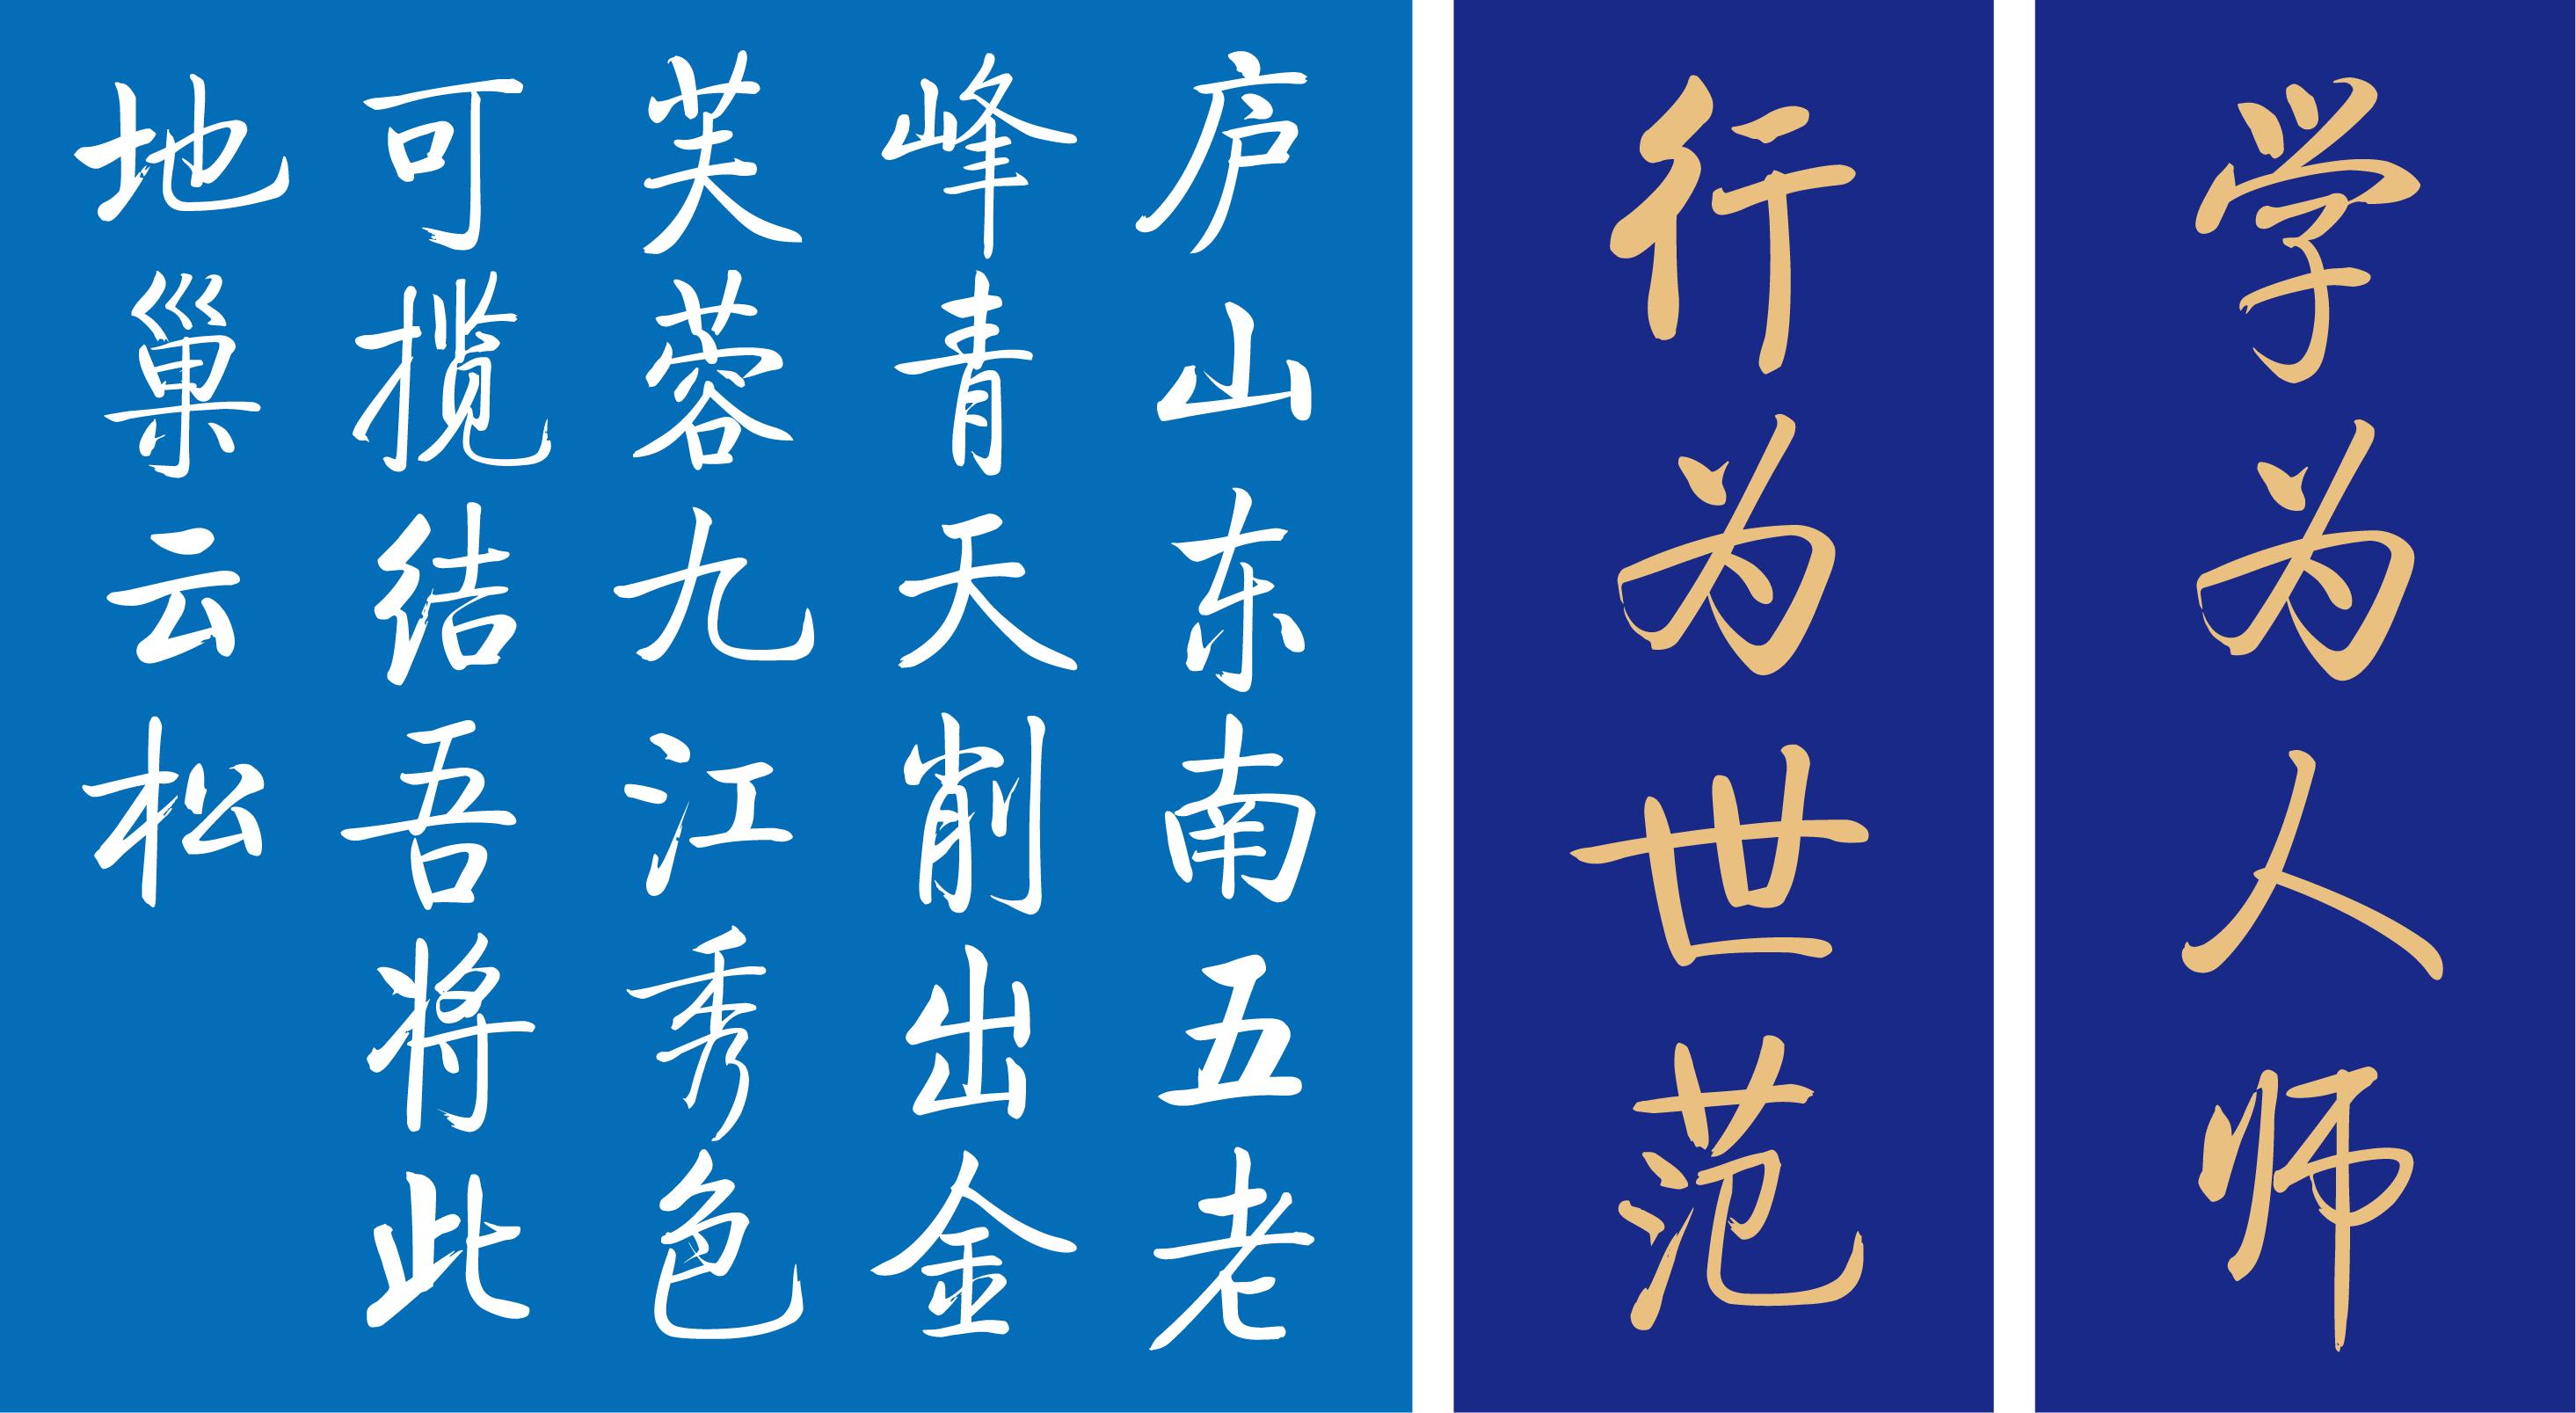 https://ft-bk1.oss-cn-zhangjiakou.aliyuncs.com/Public/Uploads/img/n_content_20201210174814_2375.png